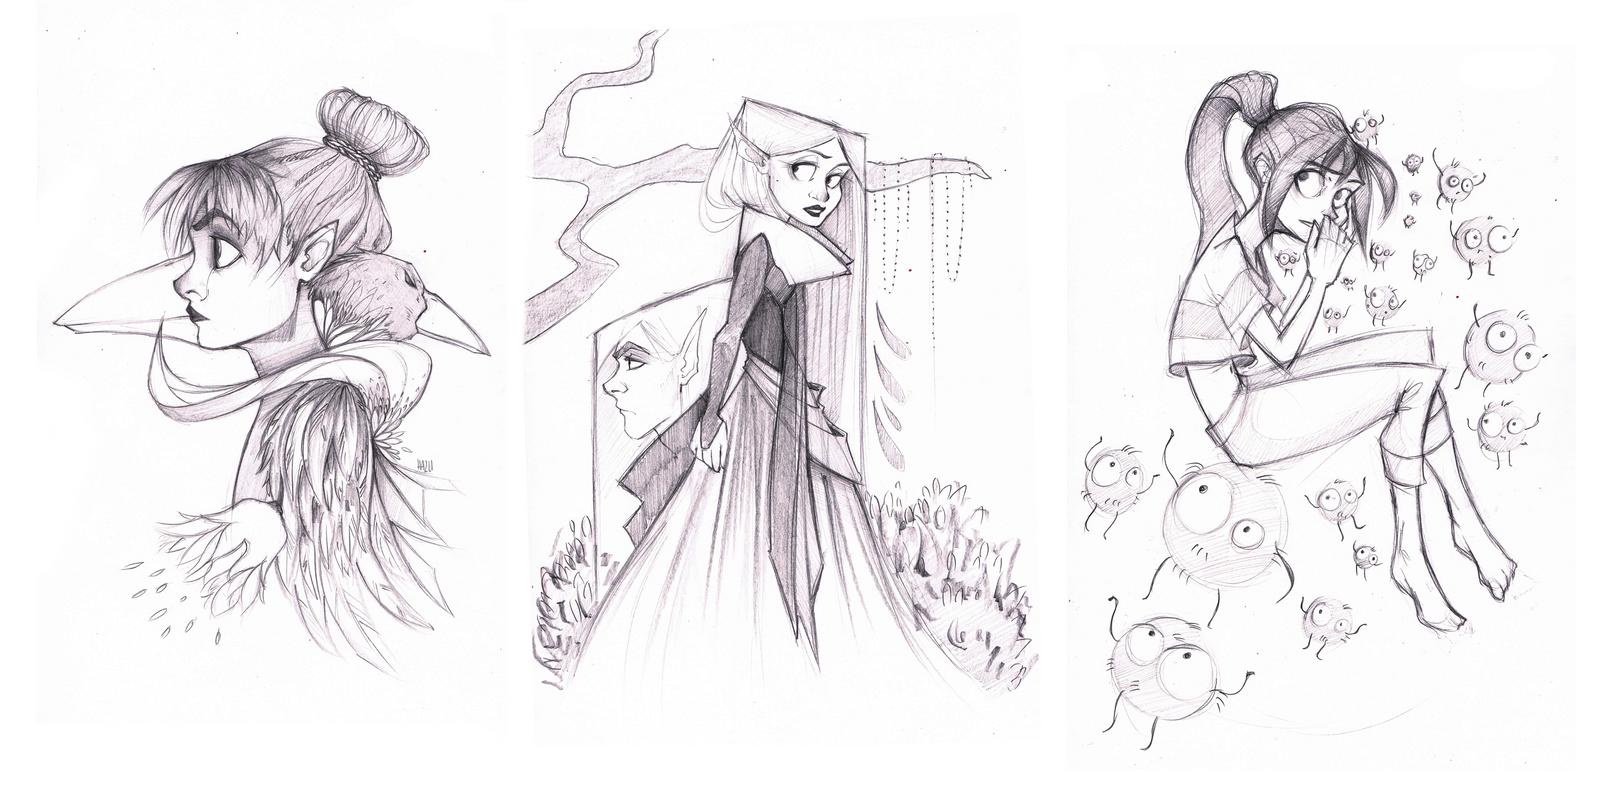 sketchies 01 by hazumonster